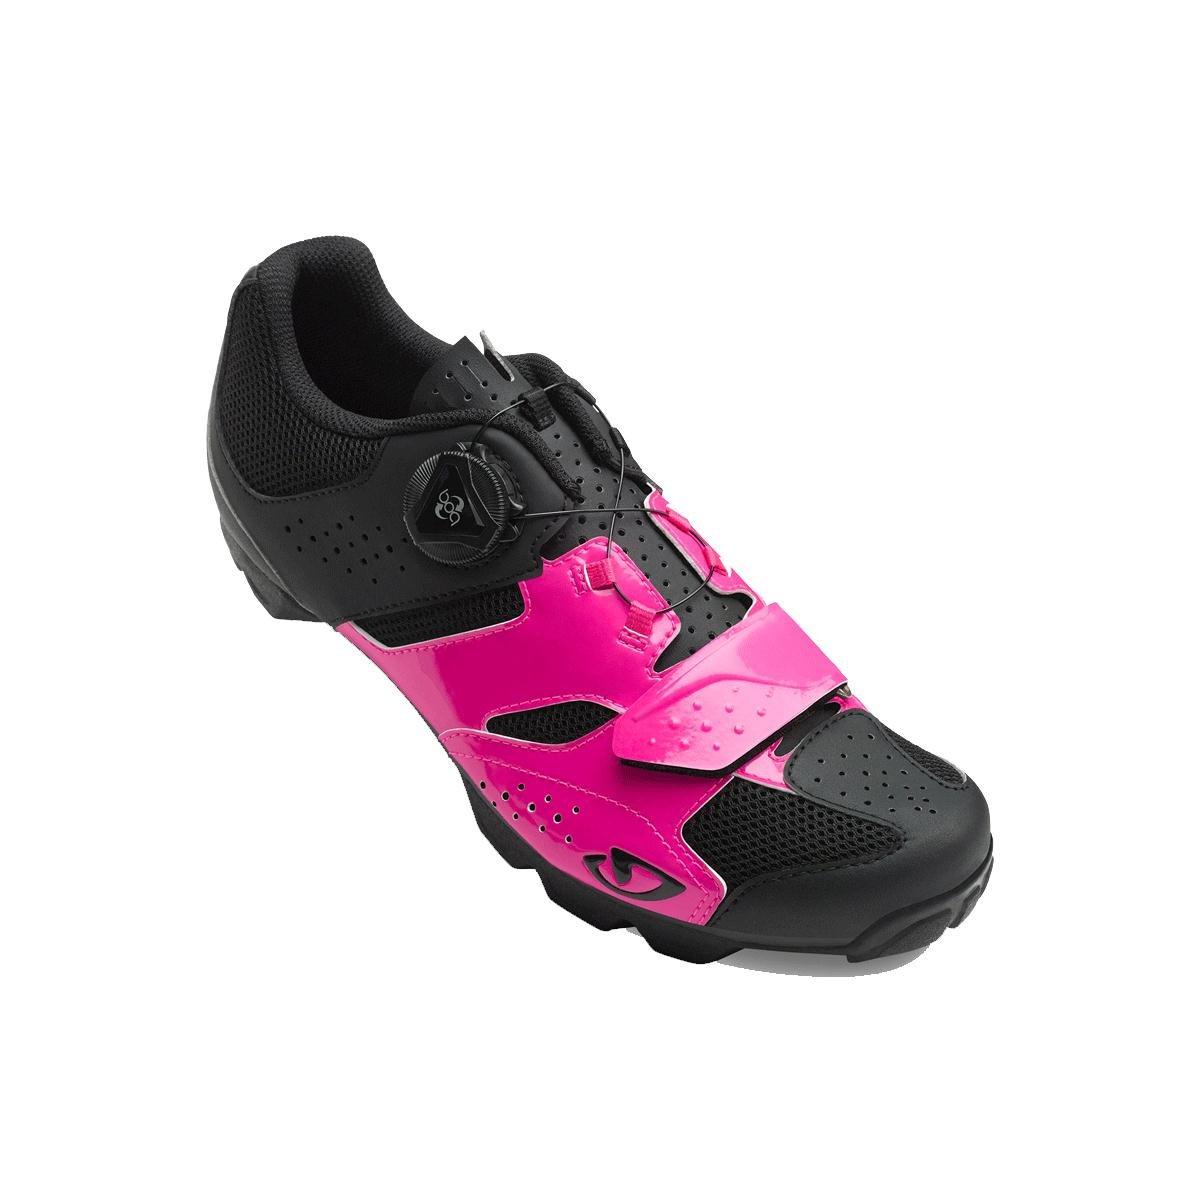 Giro円柱サイクリング靴 – Women 's B075RP4XFX 41 Bright Pink/Black Bright Pink/Black 41